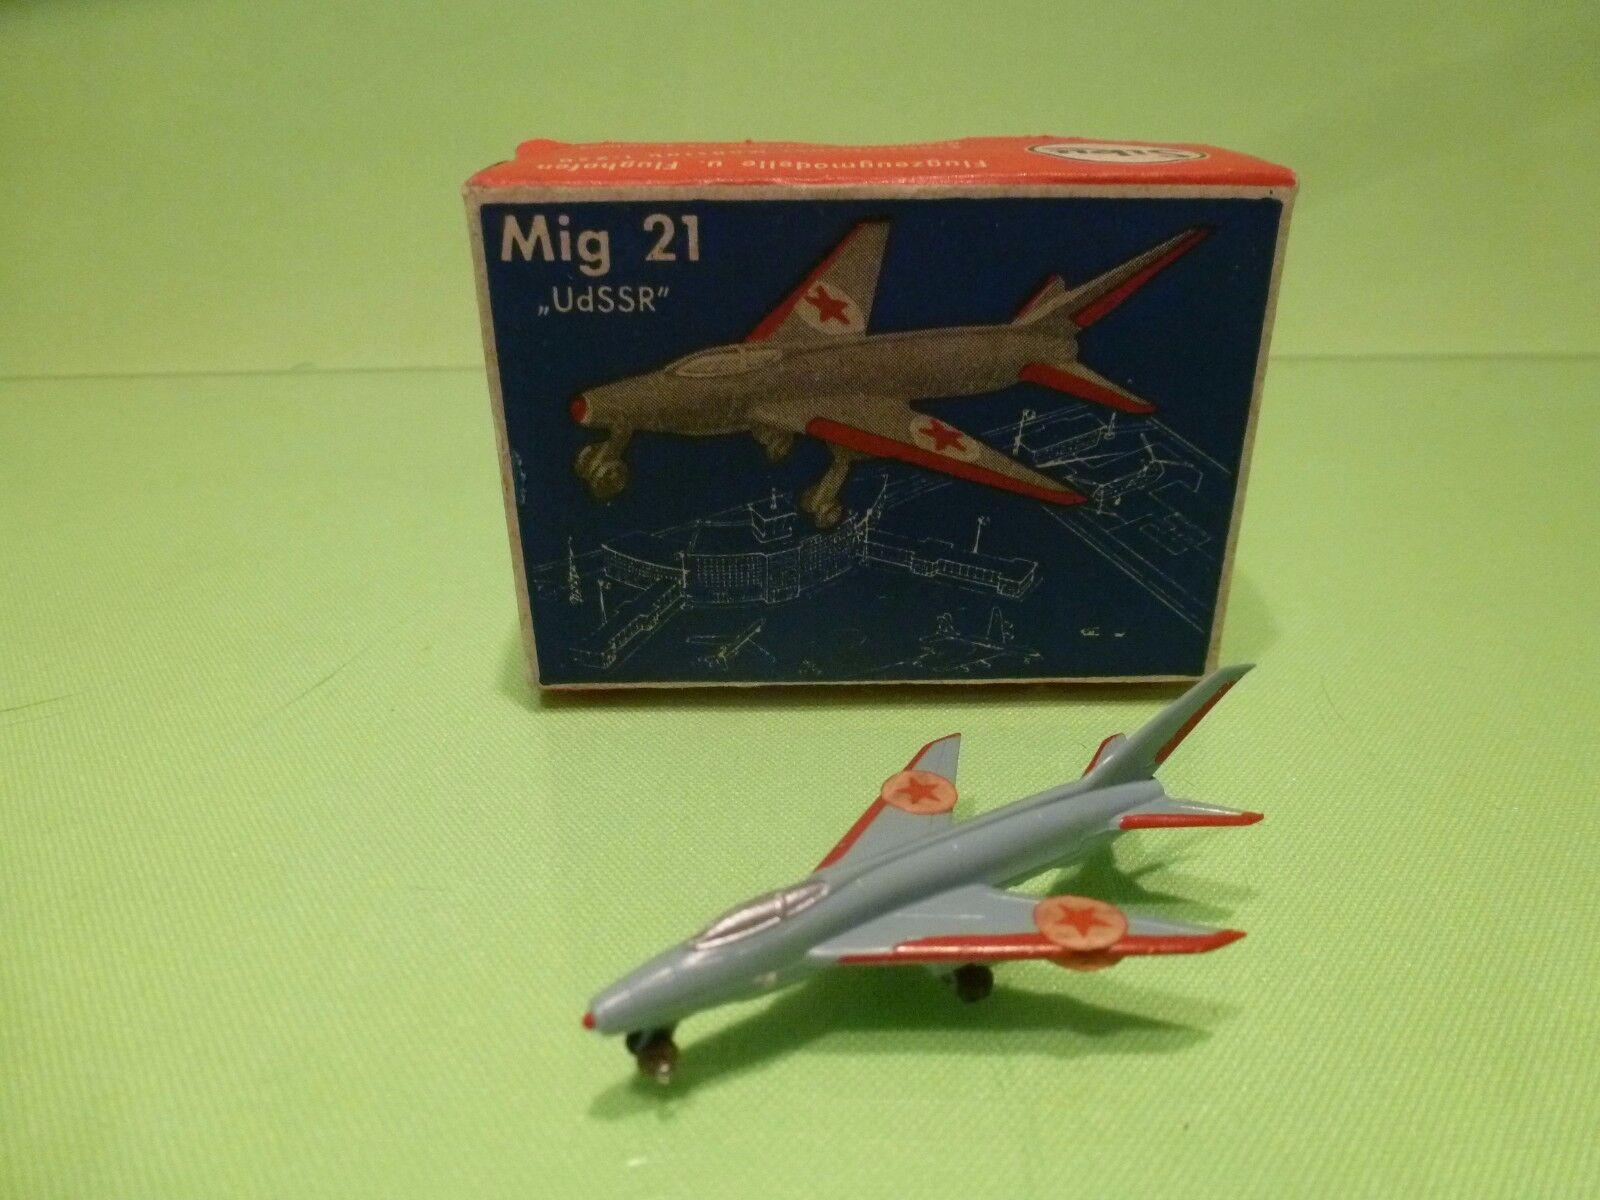 SIKU PLASTIC F33a FLUGZEUG MIG 21 UDSR - blå röd 1 250 - GOTT I låda - PLASTIK